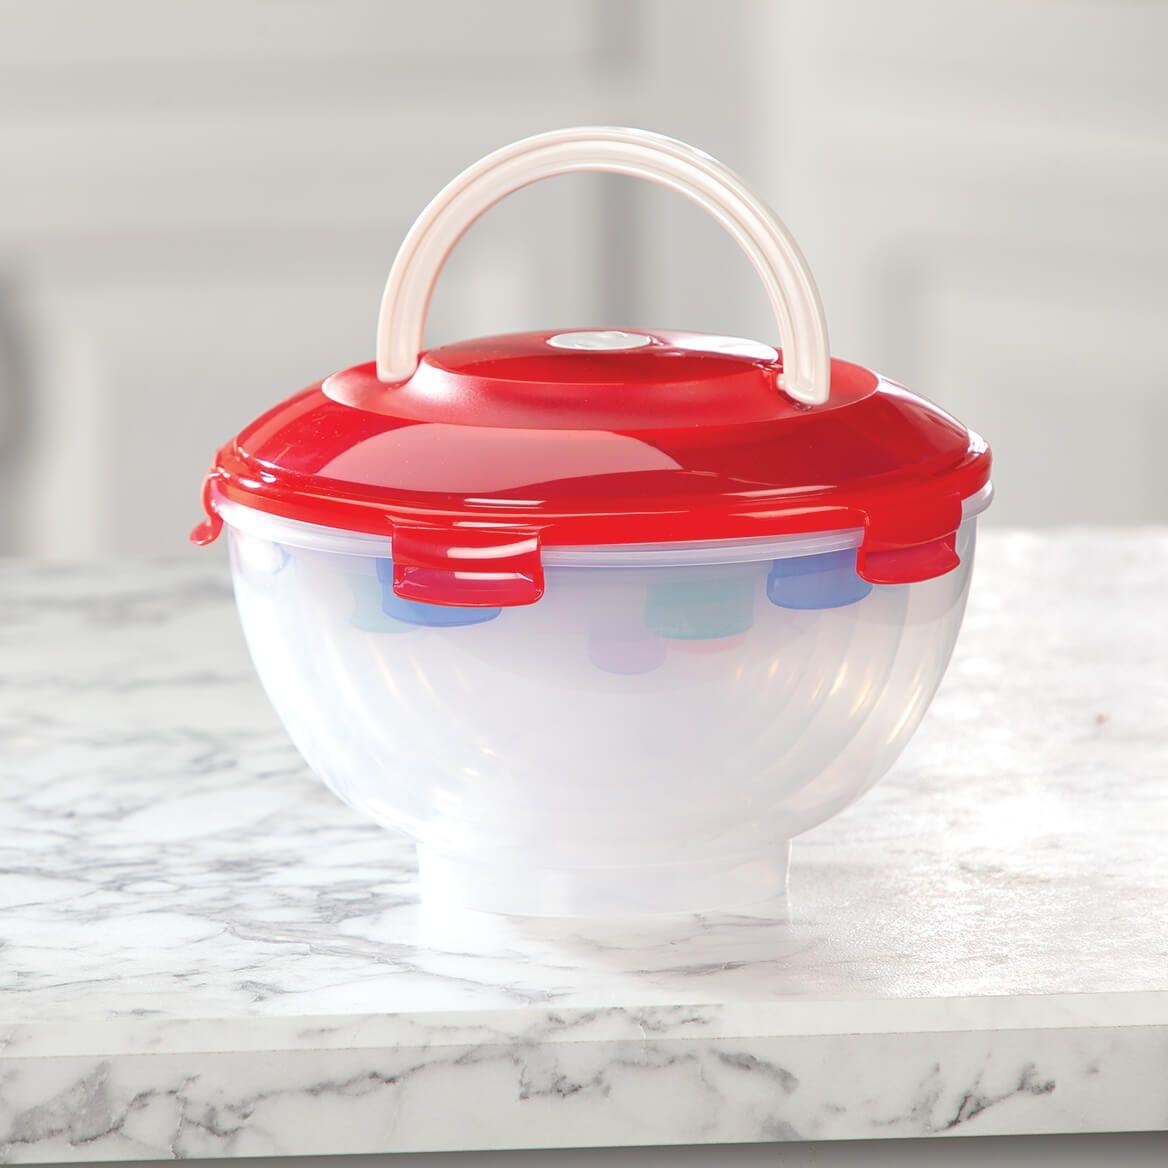 Locking Bowl Set with Handles, 10-Piece Set-371125